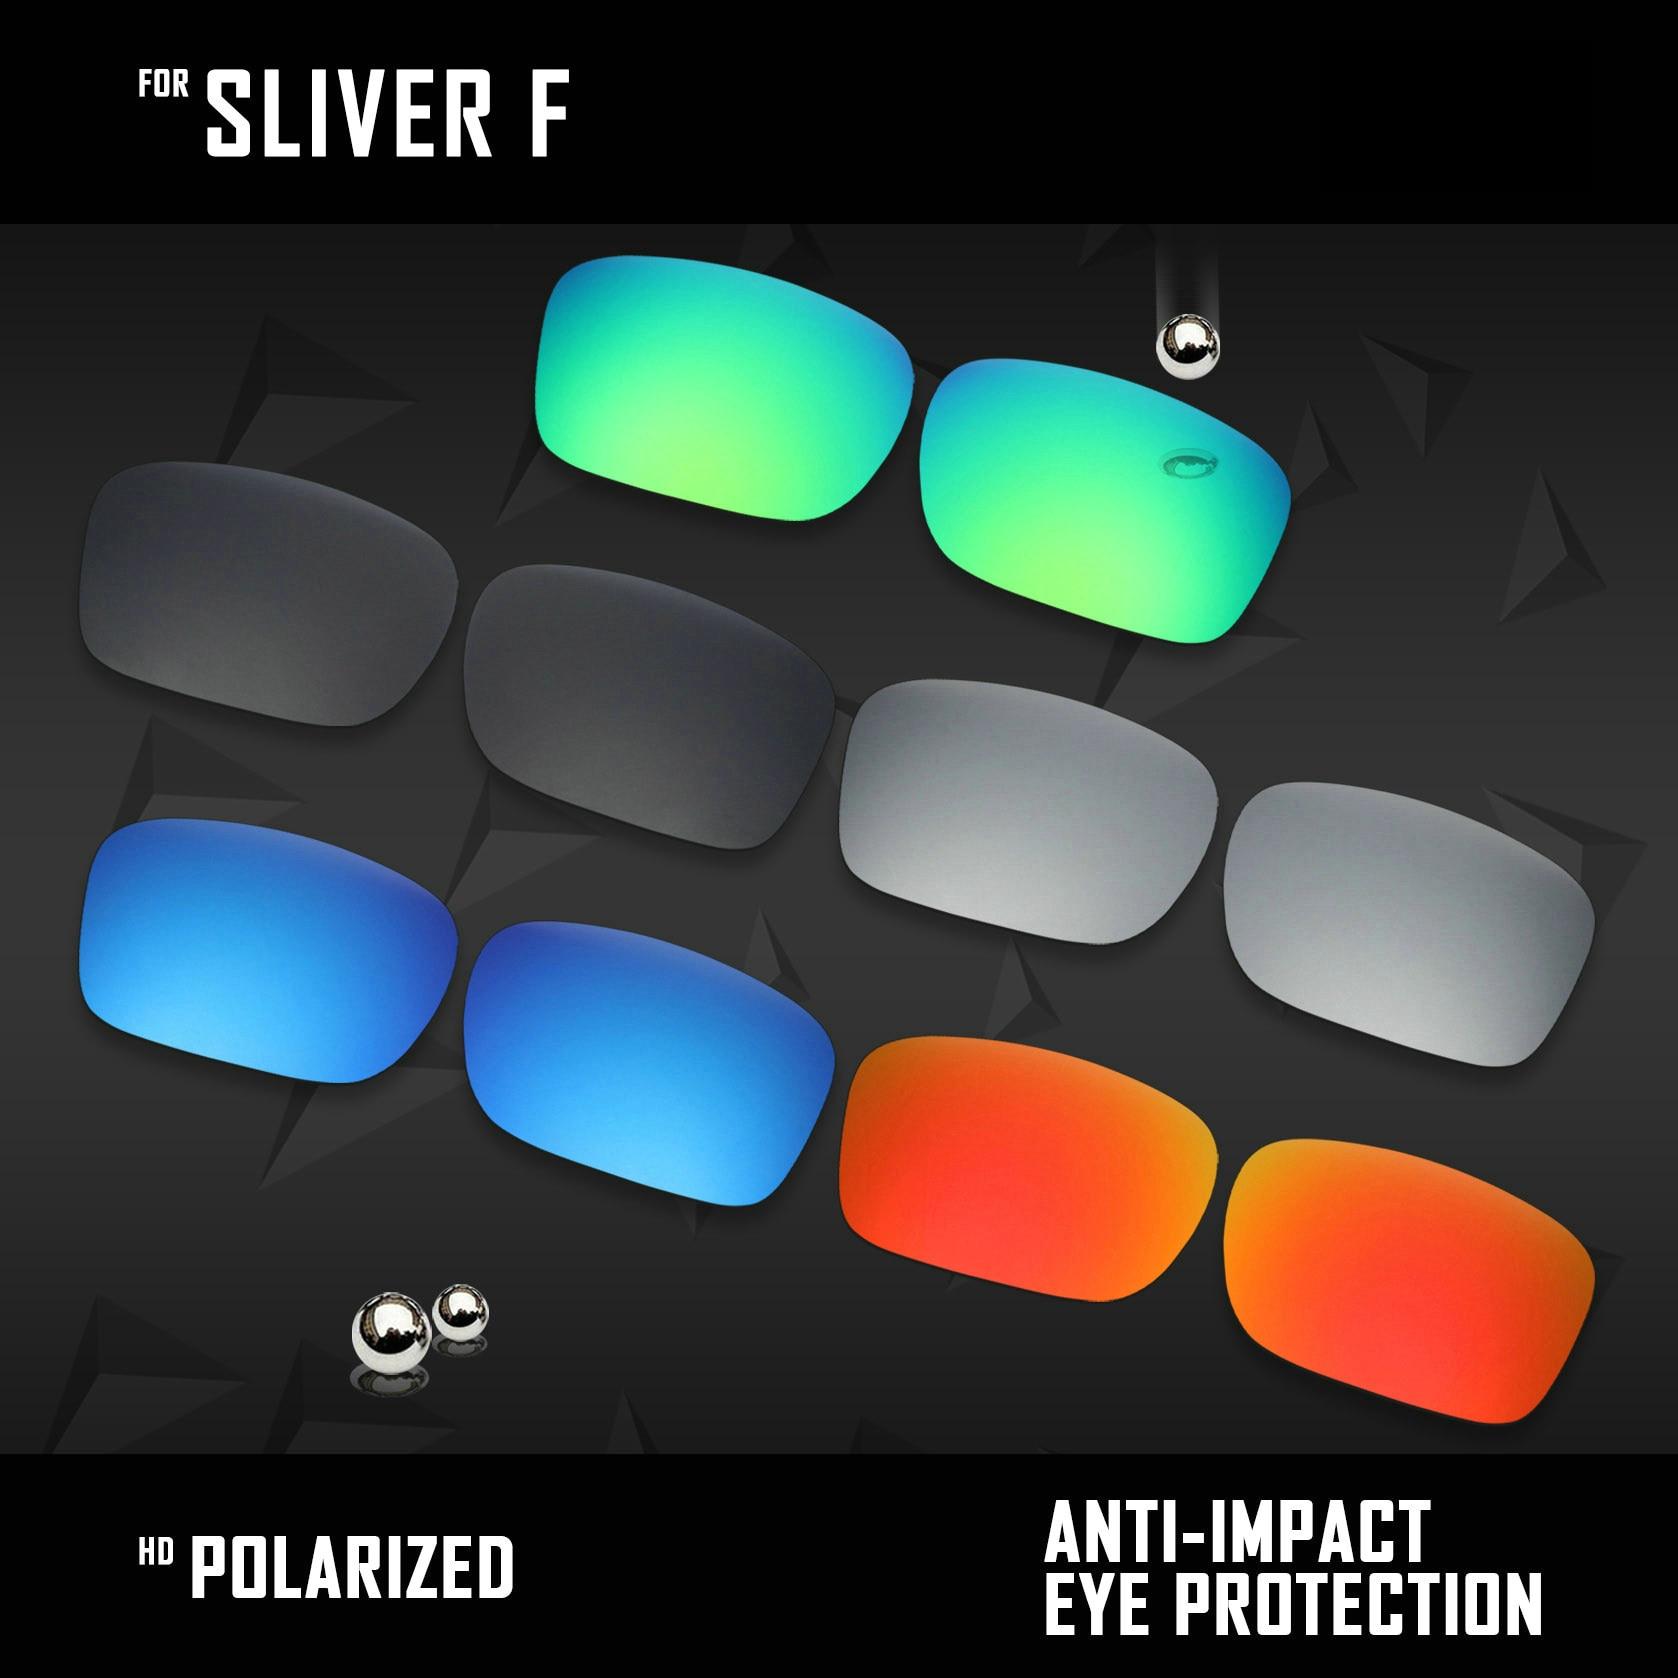 OOWLIT 5 أزواج الاستقطاب النظارات الشمسية عدسات لاستبدال أوكلي الشظية F OO9246-Black والفضة و الجليد الأزرق و الأحمر و الزمرد الأخضر